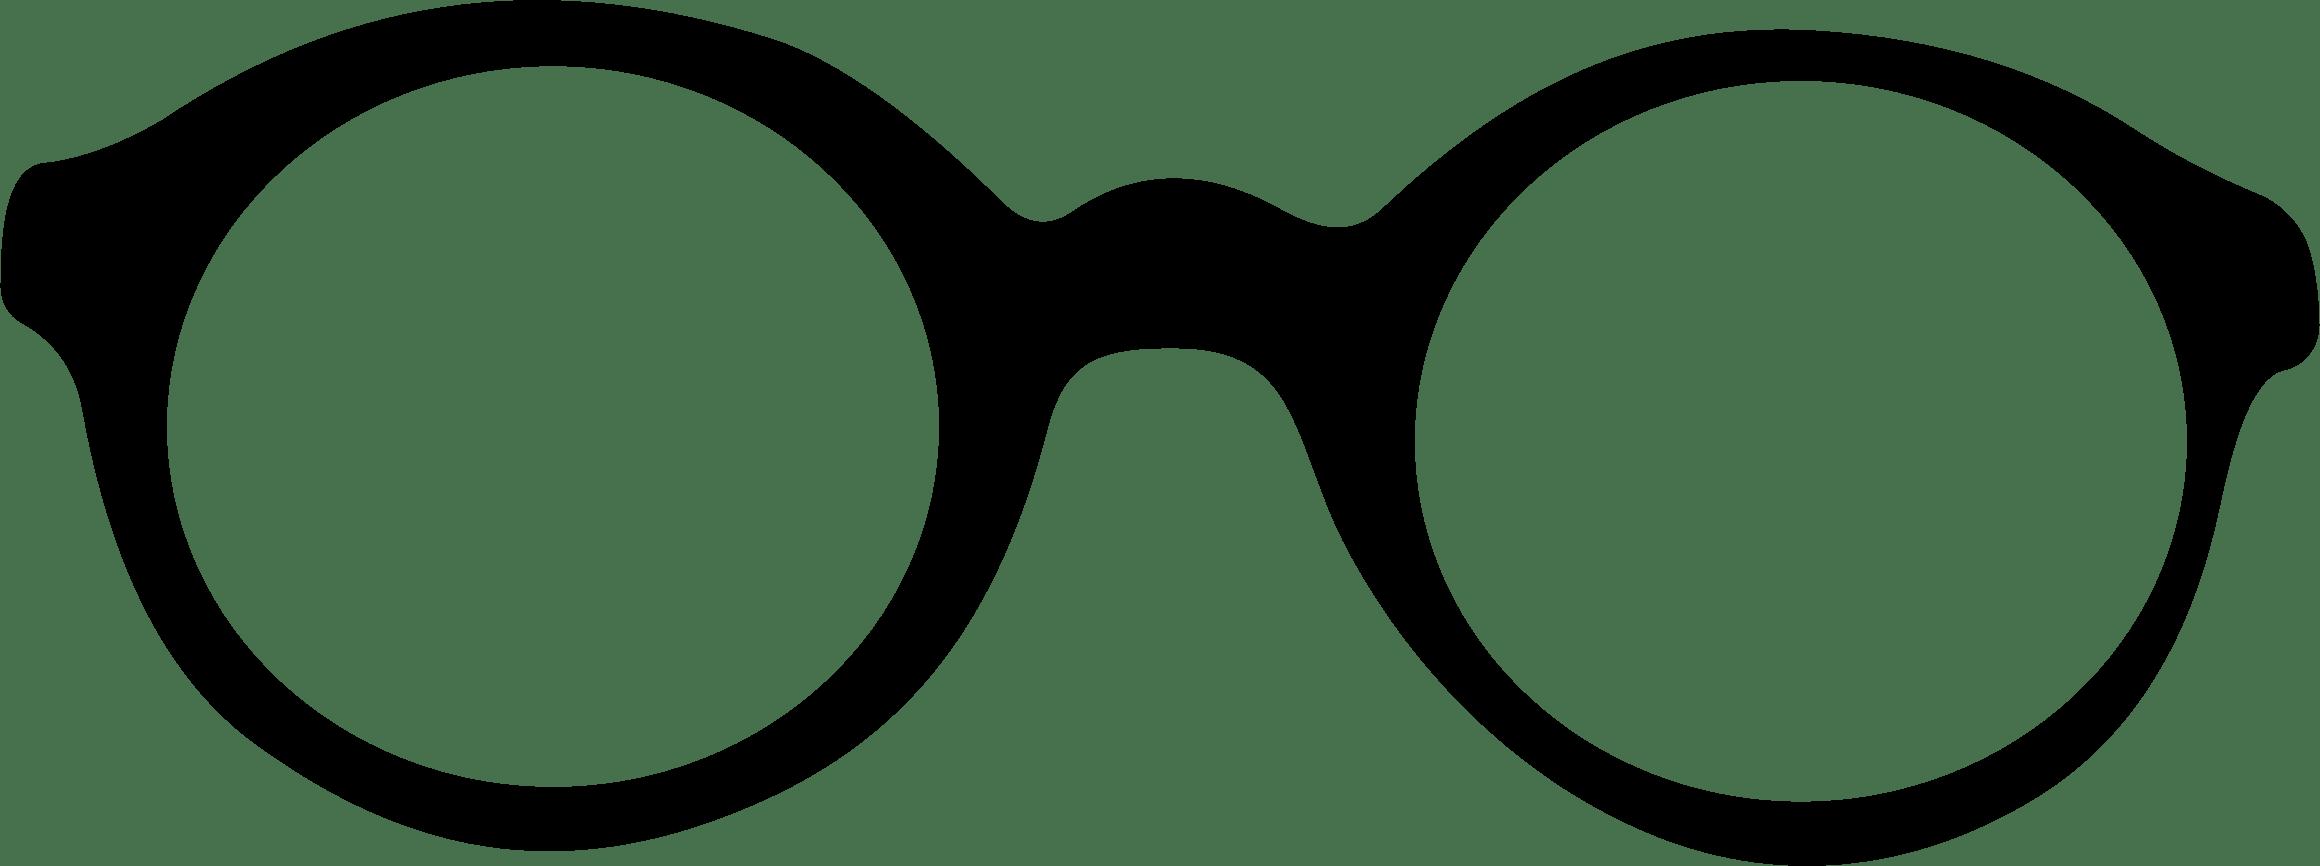 Sunglasses Clipart Gclipart